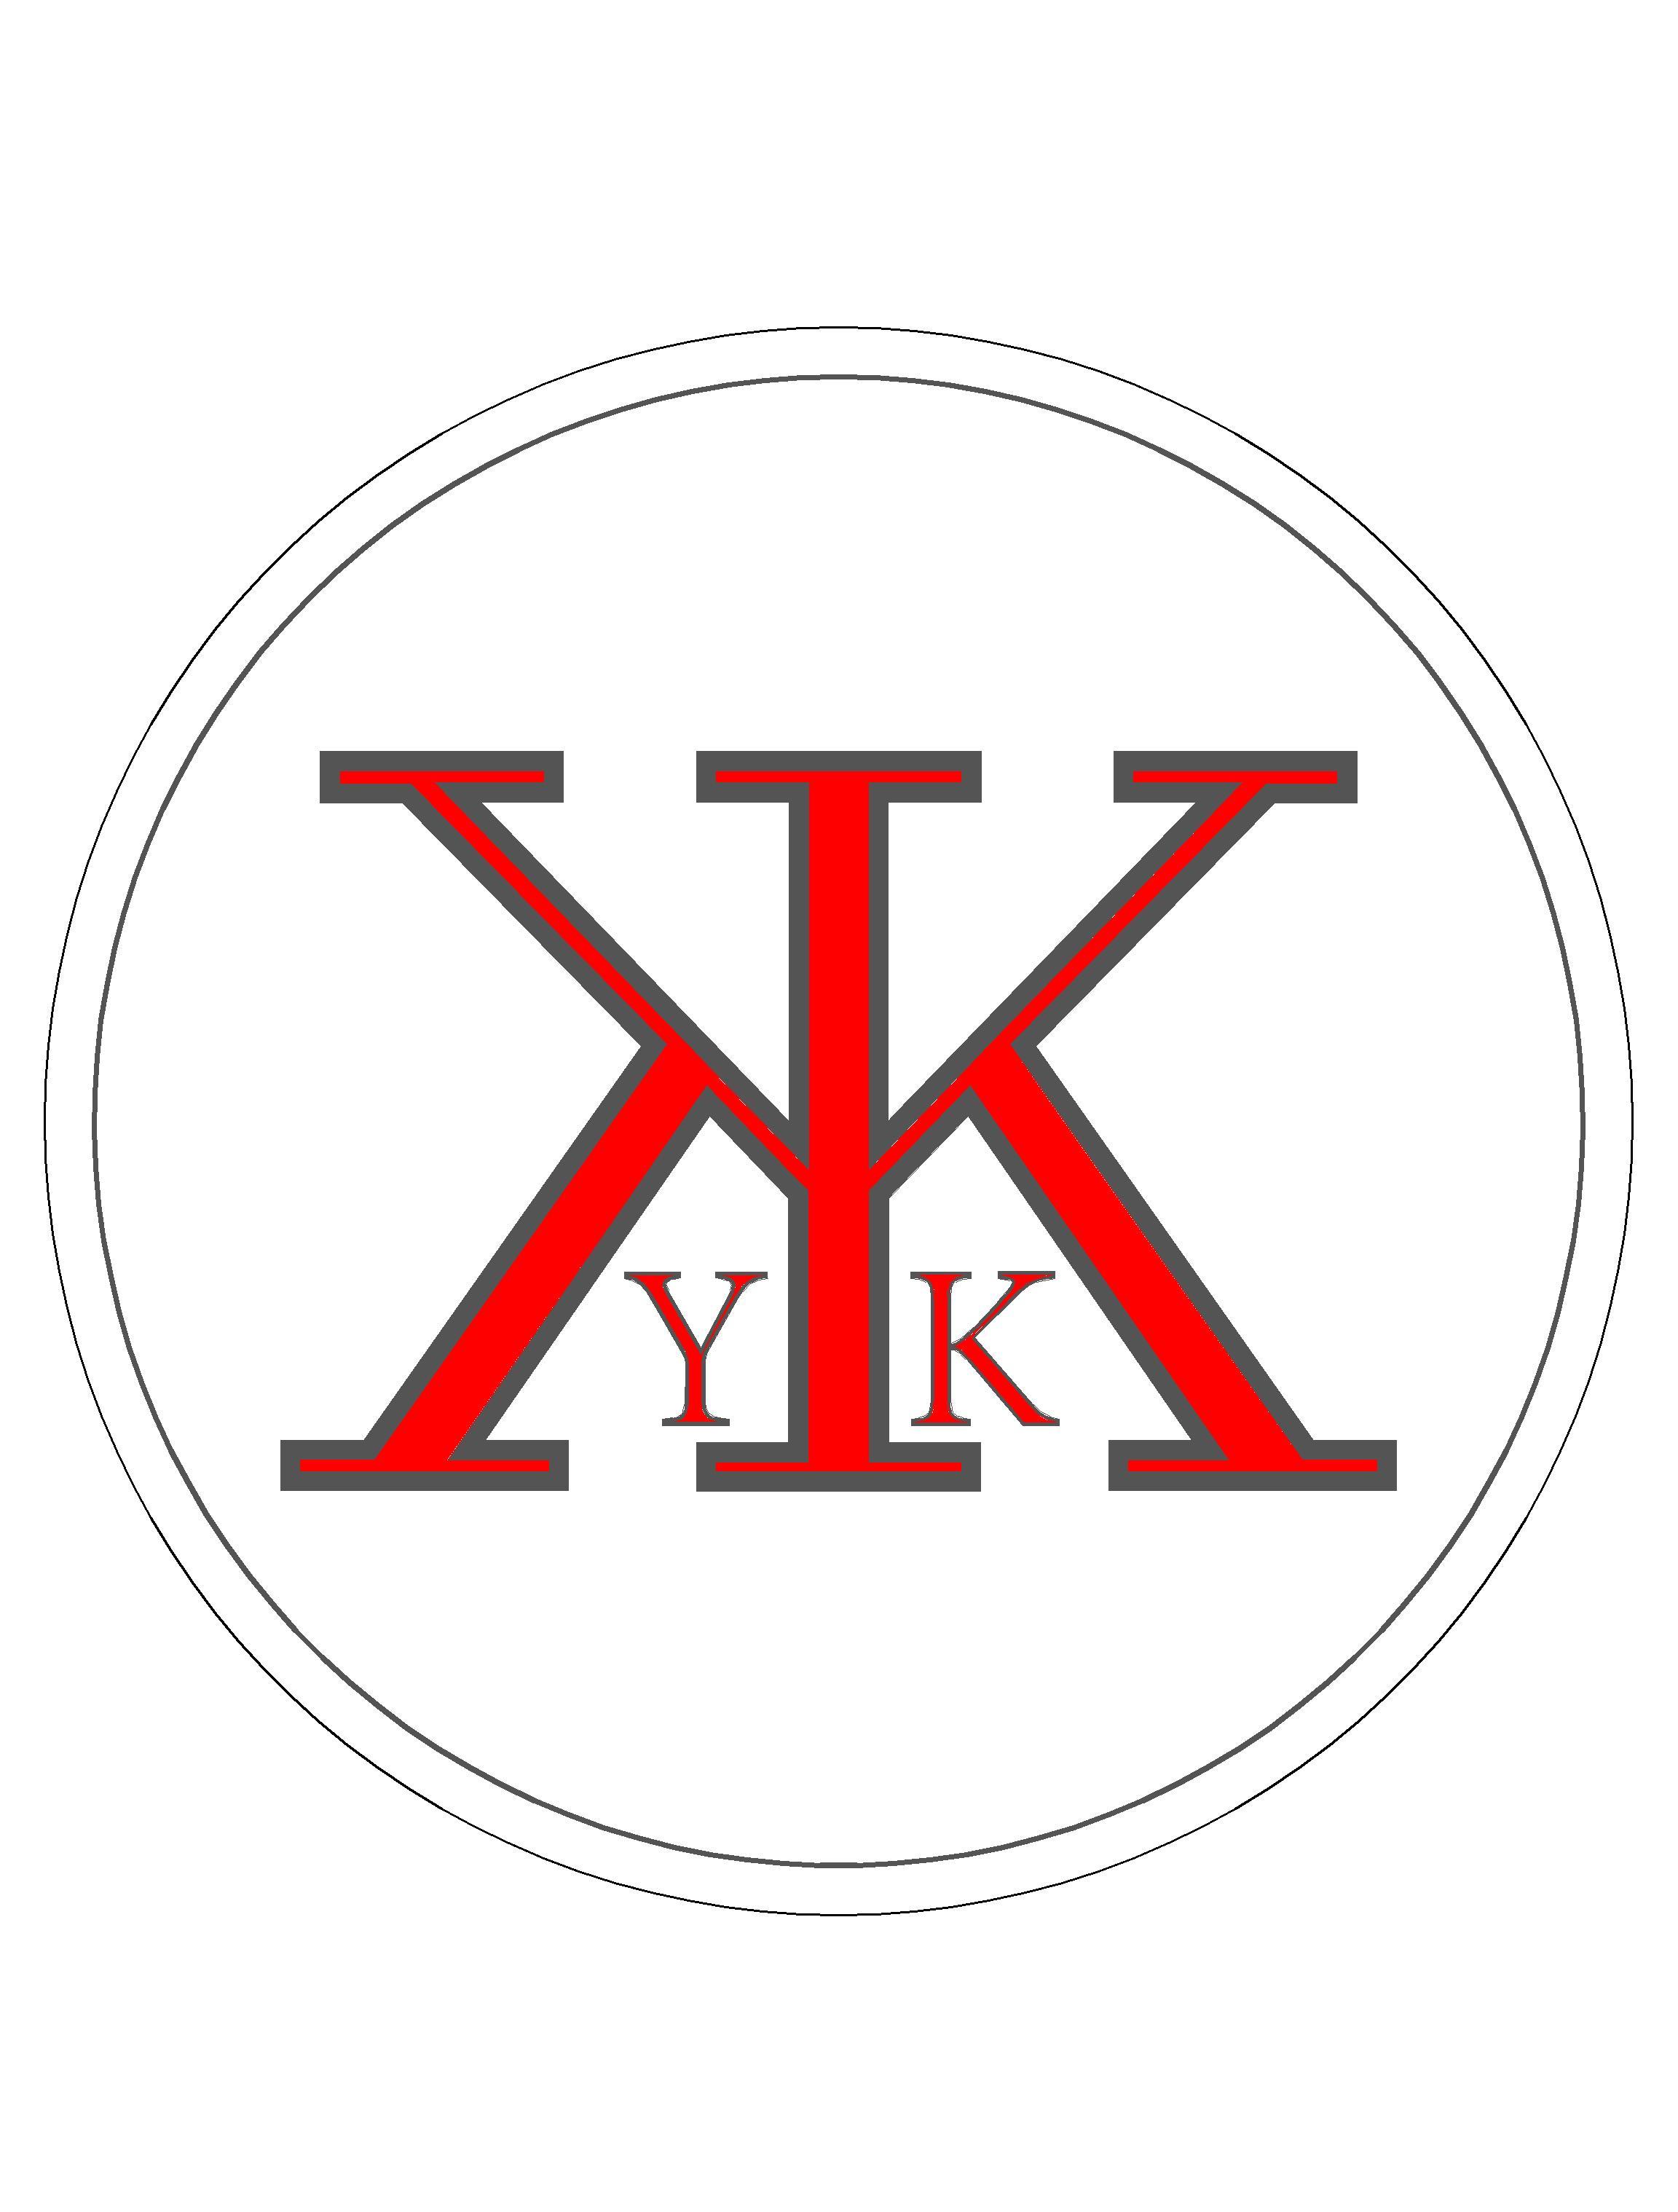 Нужен логотип (эмблема) для самодельного квадроцикла фото f_8435afd299a787b9.jpg